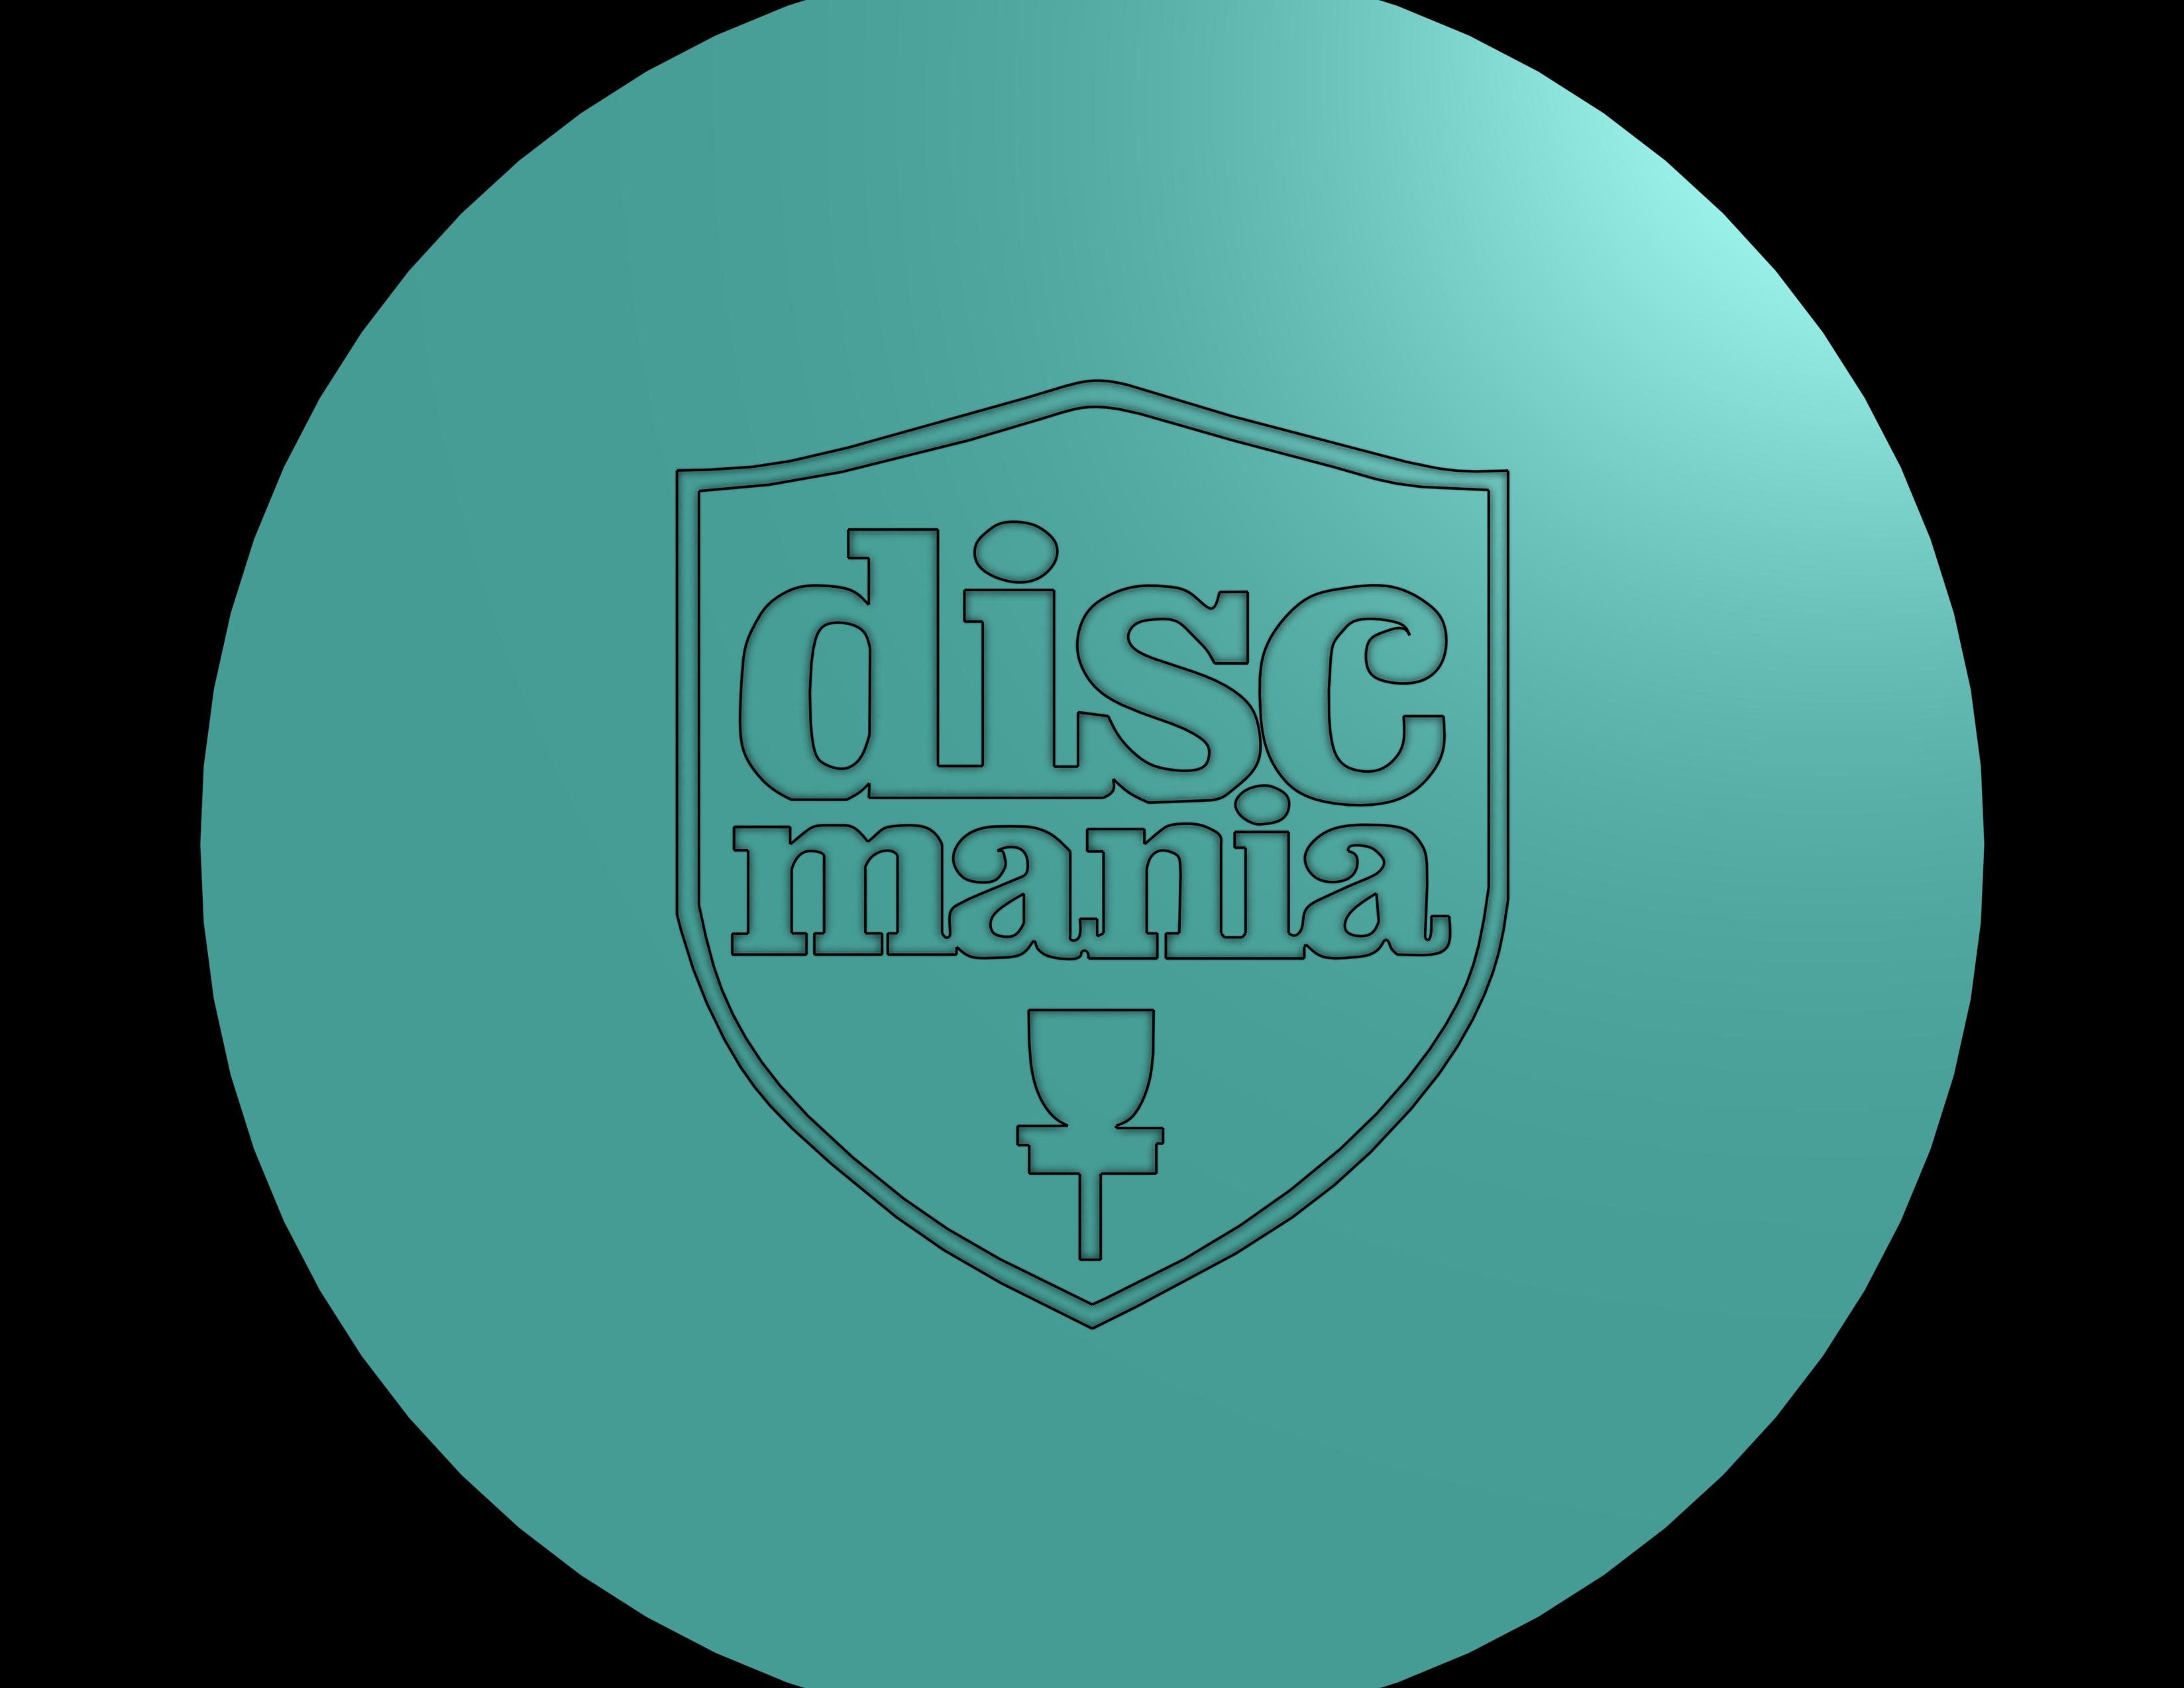 Disc mania.png Download free STL file Disc Golf Coaster set • 3D printable design, parkerpate28